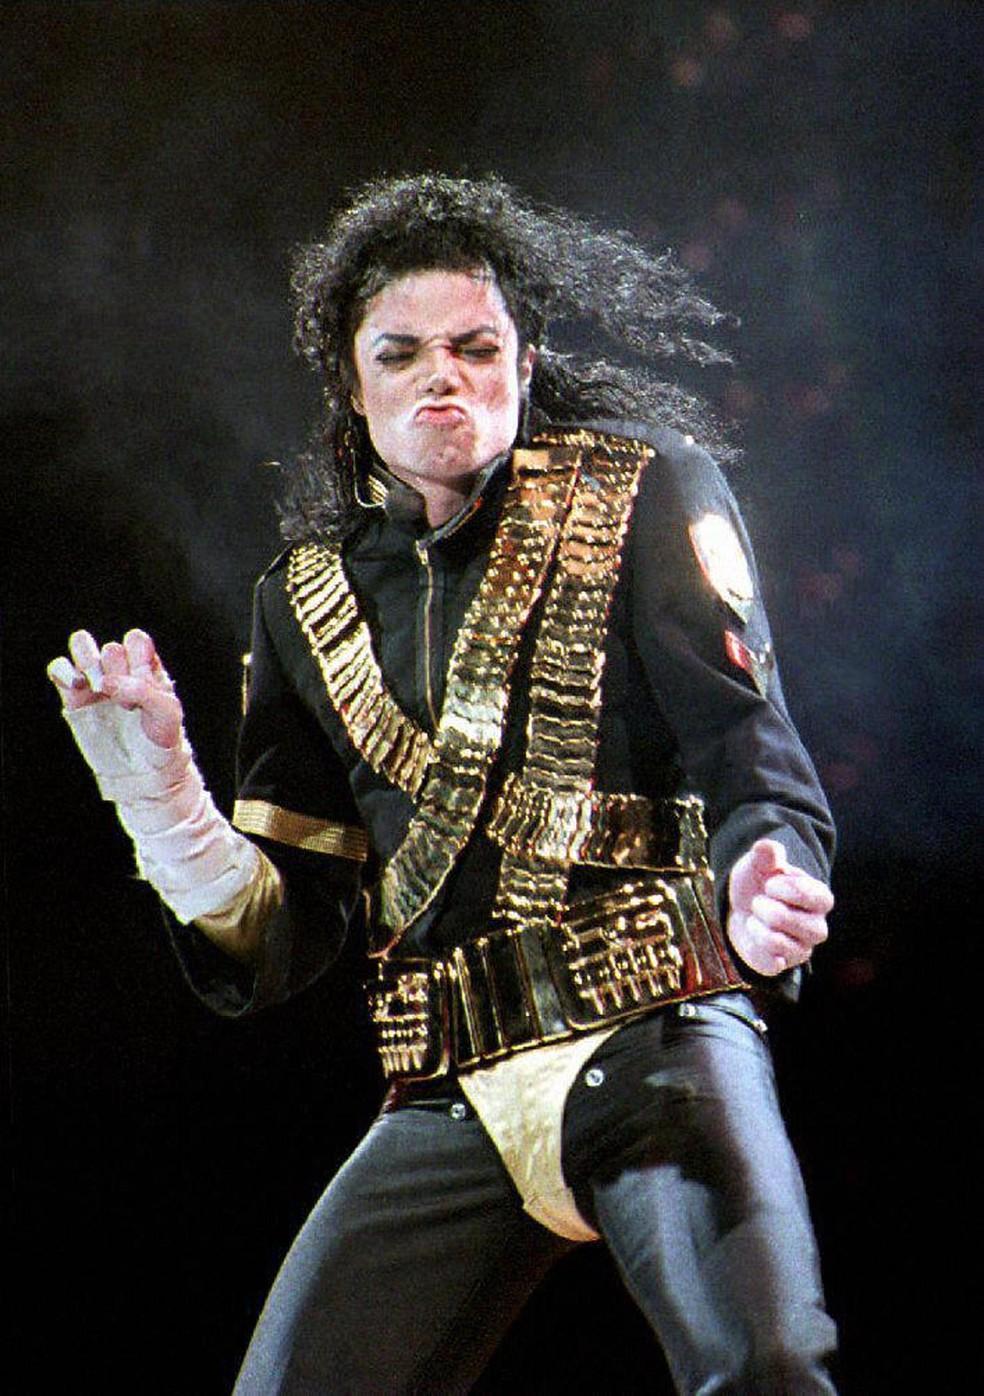 Michael Jackson durante show em agosto de 1993 (Foto: Roslan RAHMAN / AFP)